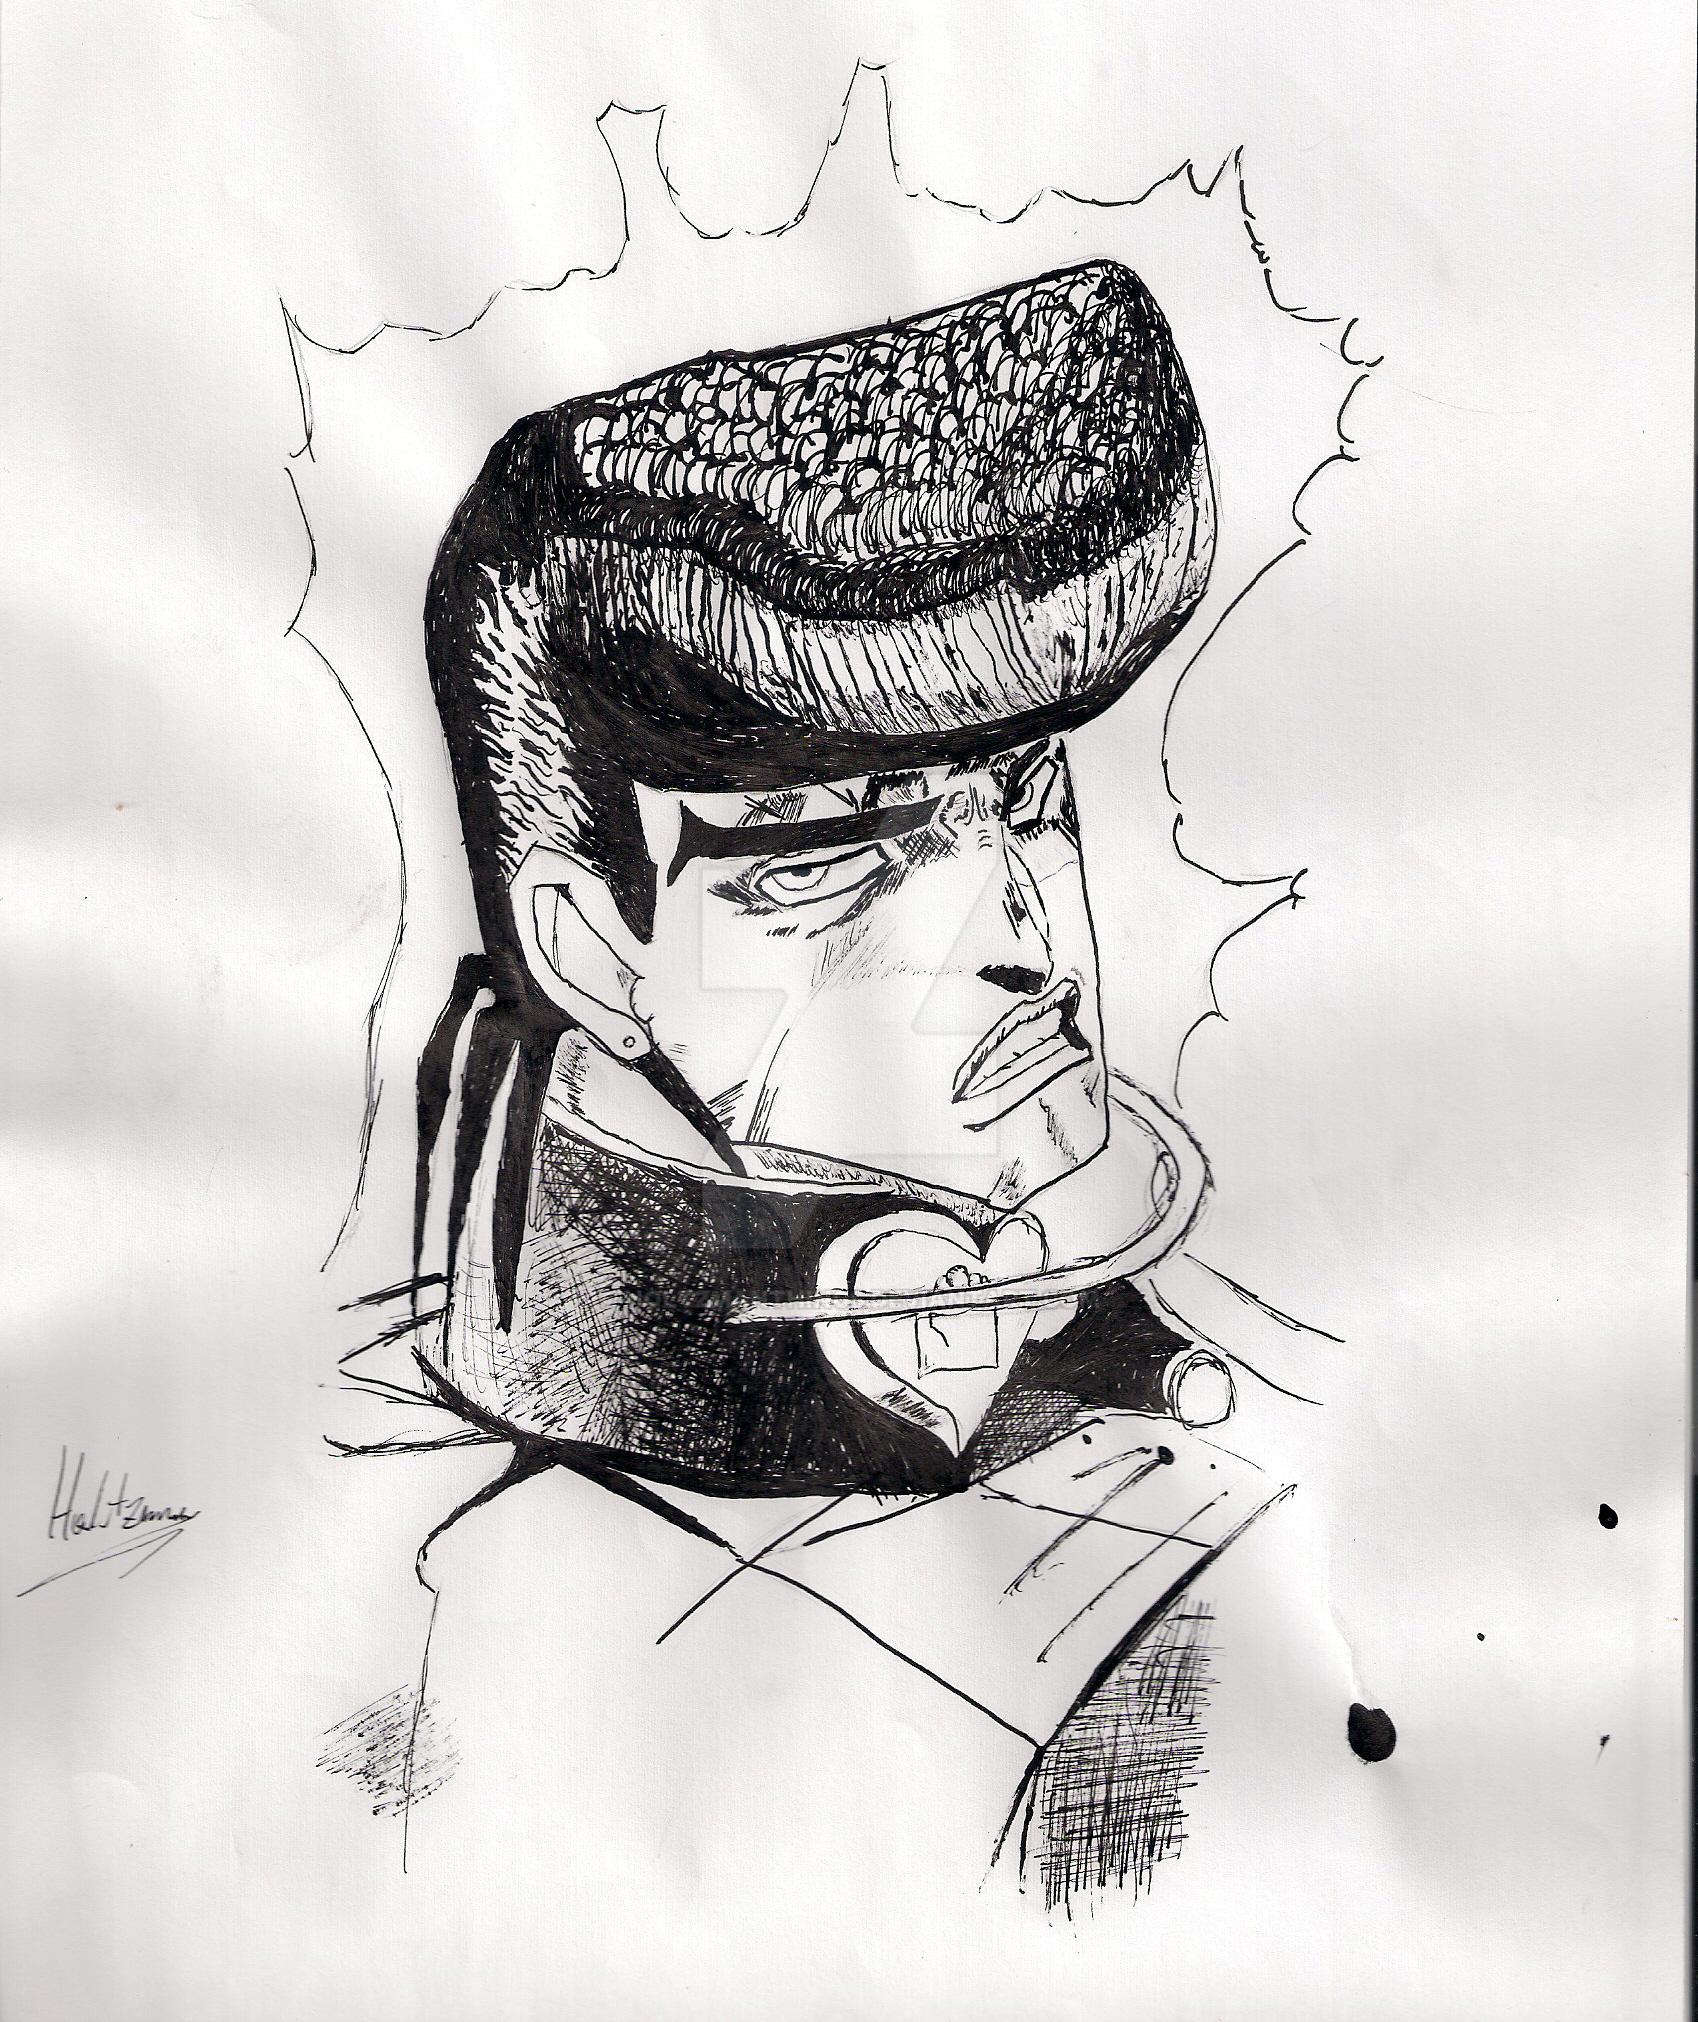 Josuke Higashikata 2 By HoltzmanThings On DeviantArt